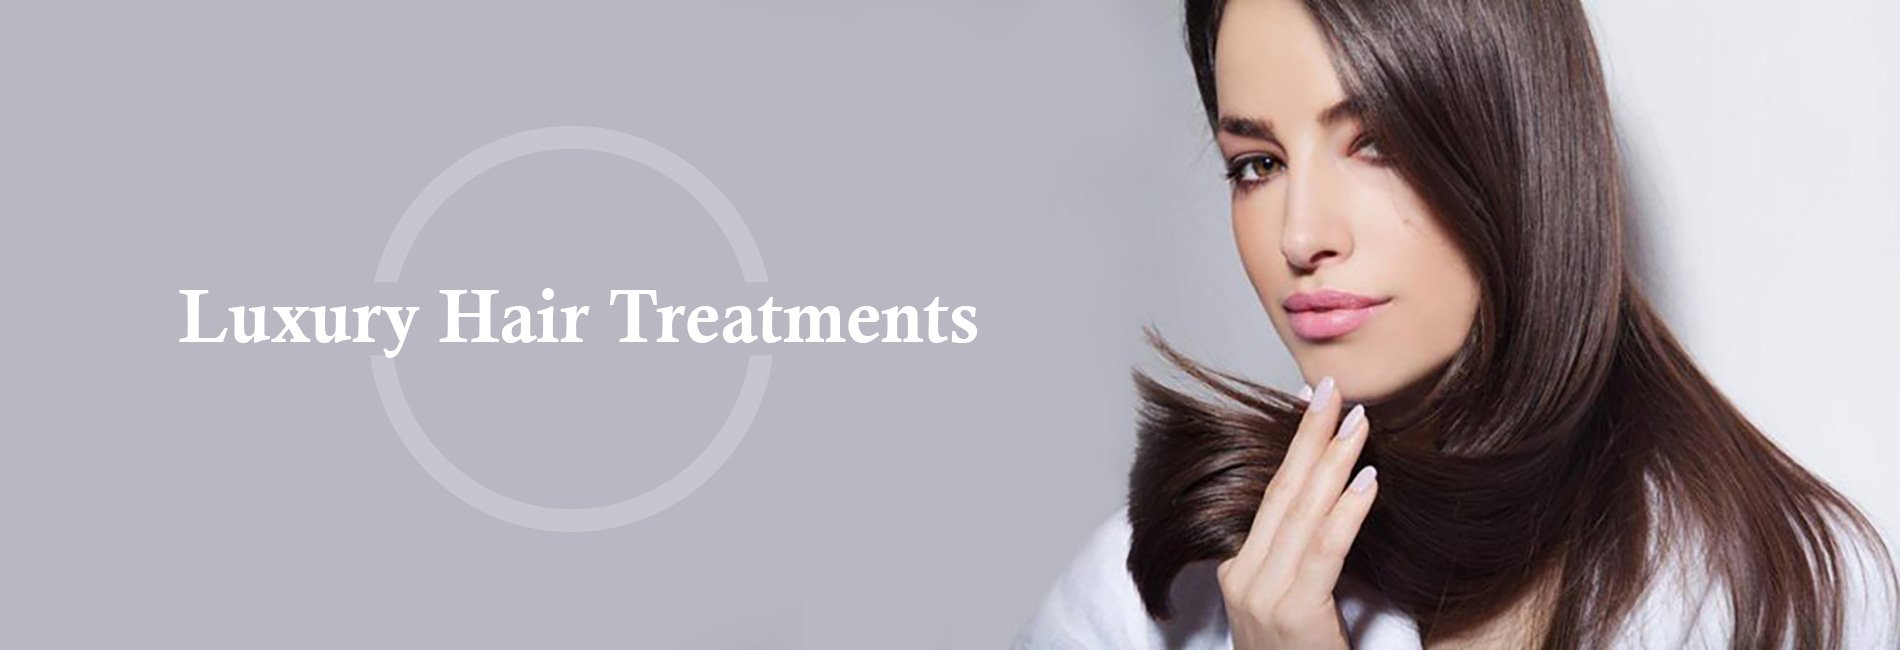 Luxury Hair Treatments 2